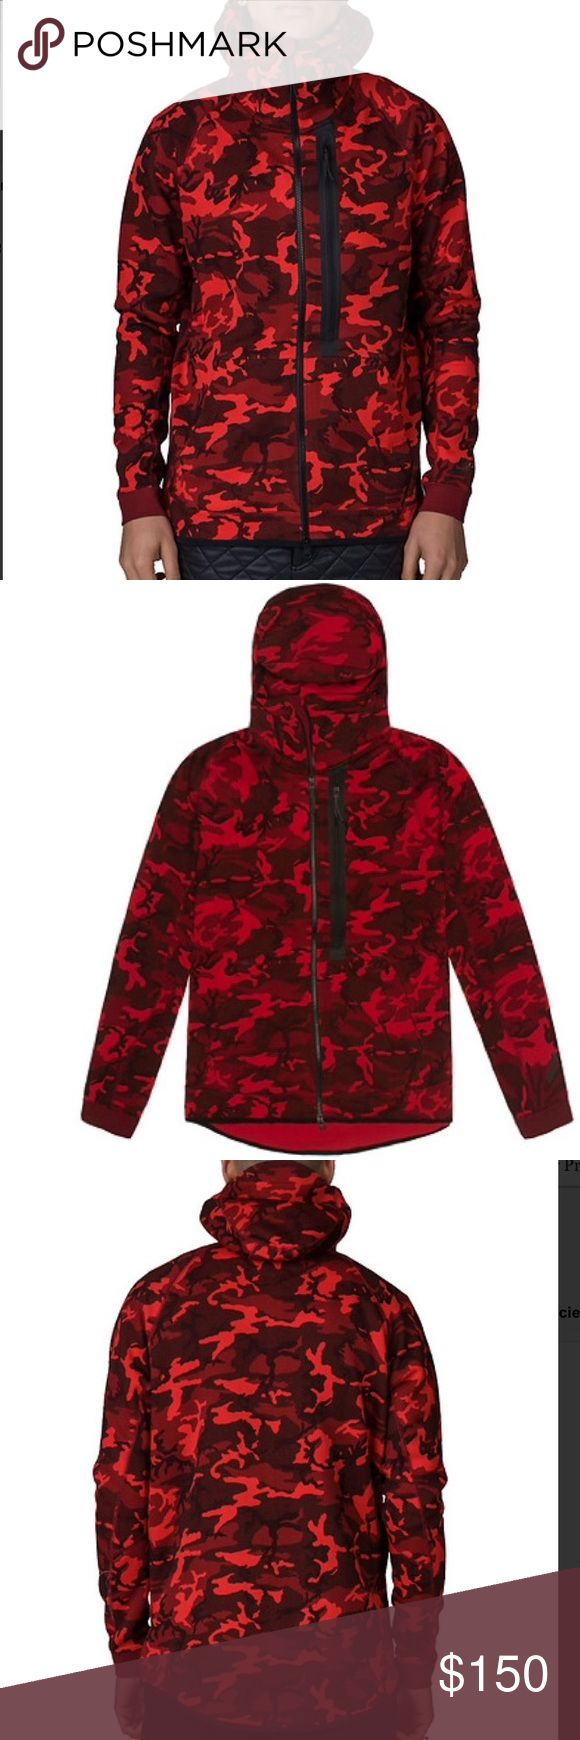 Nike Red Tech Fleece Full Zip Camo Hoodie Sweater NWT